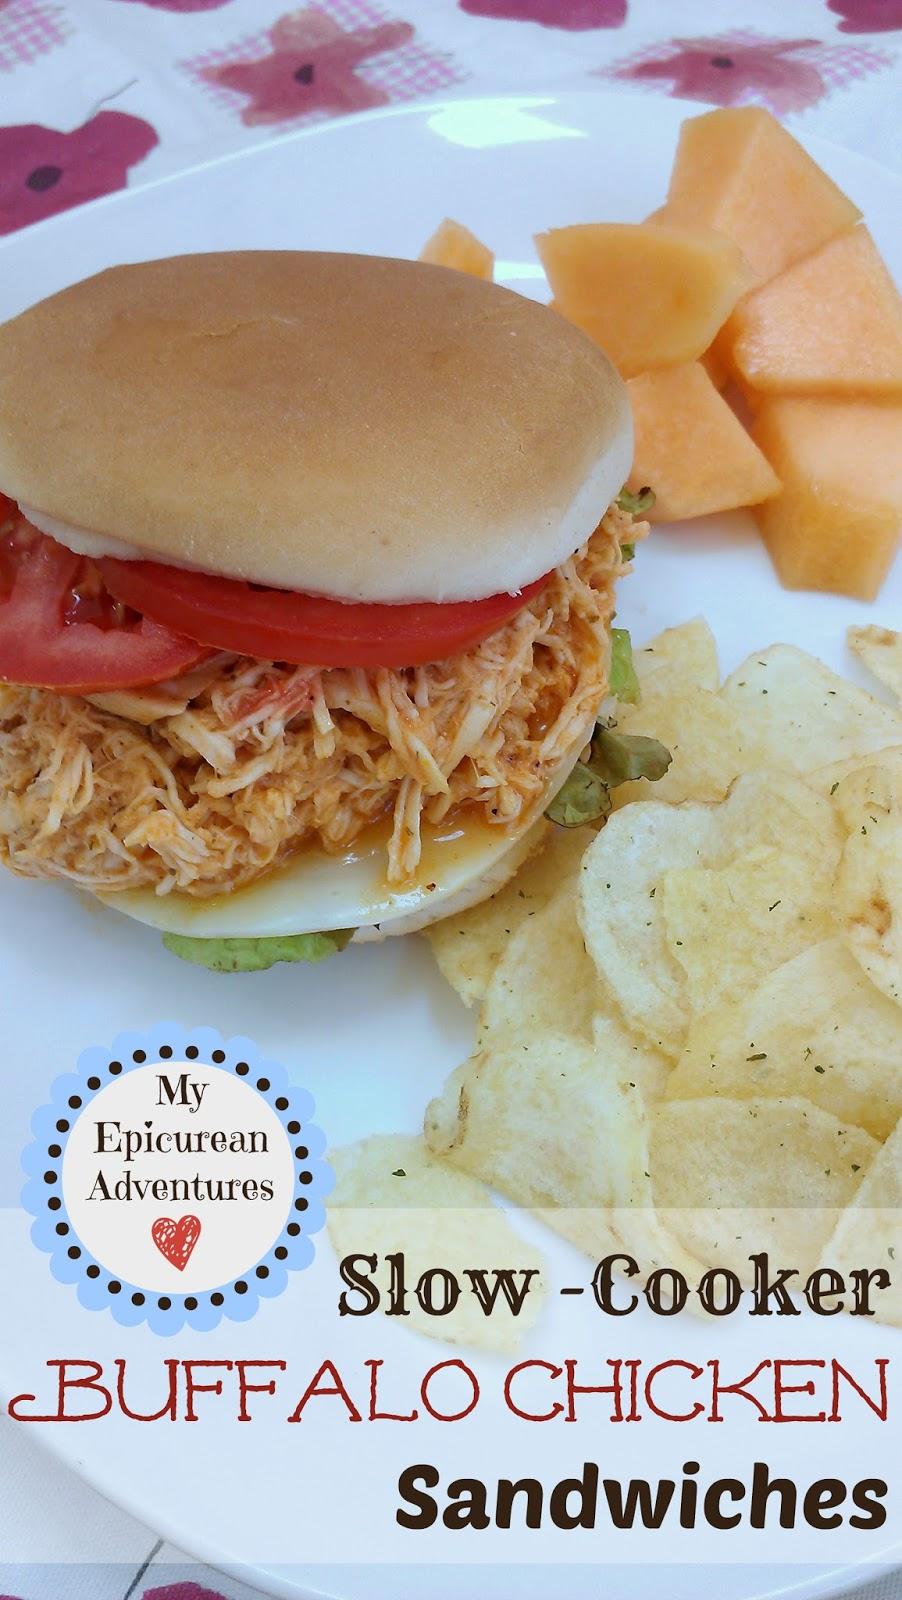 ... Epicurean Adventures: Slow-Cooker Shredded Buffalo Chicken Sandwiches